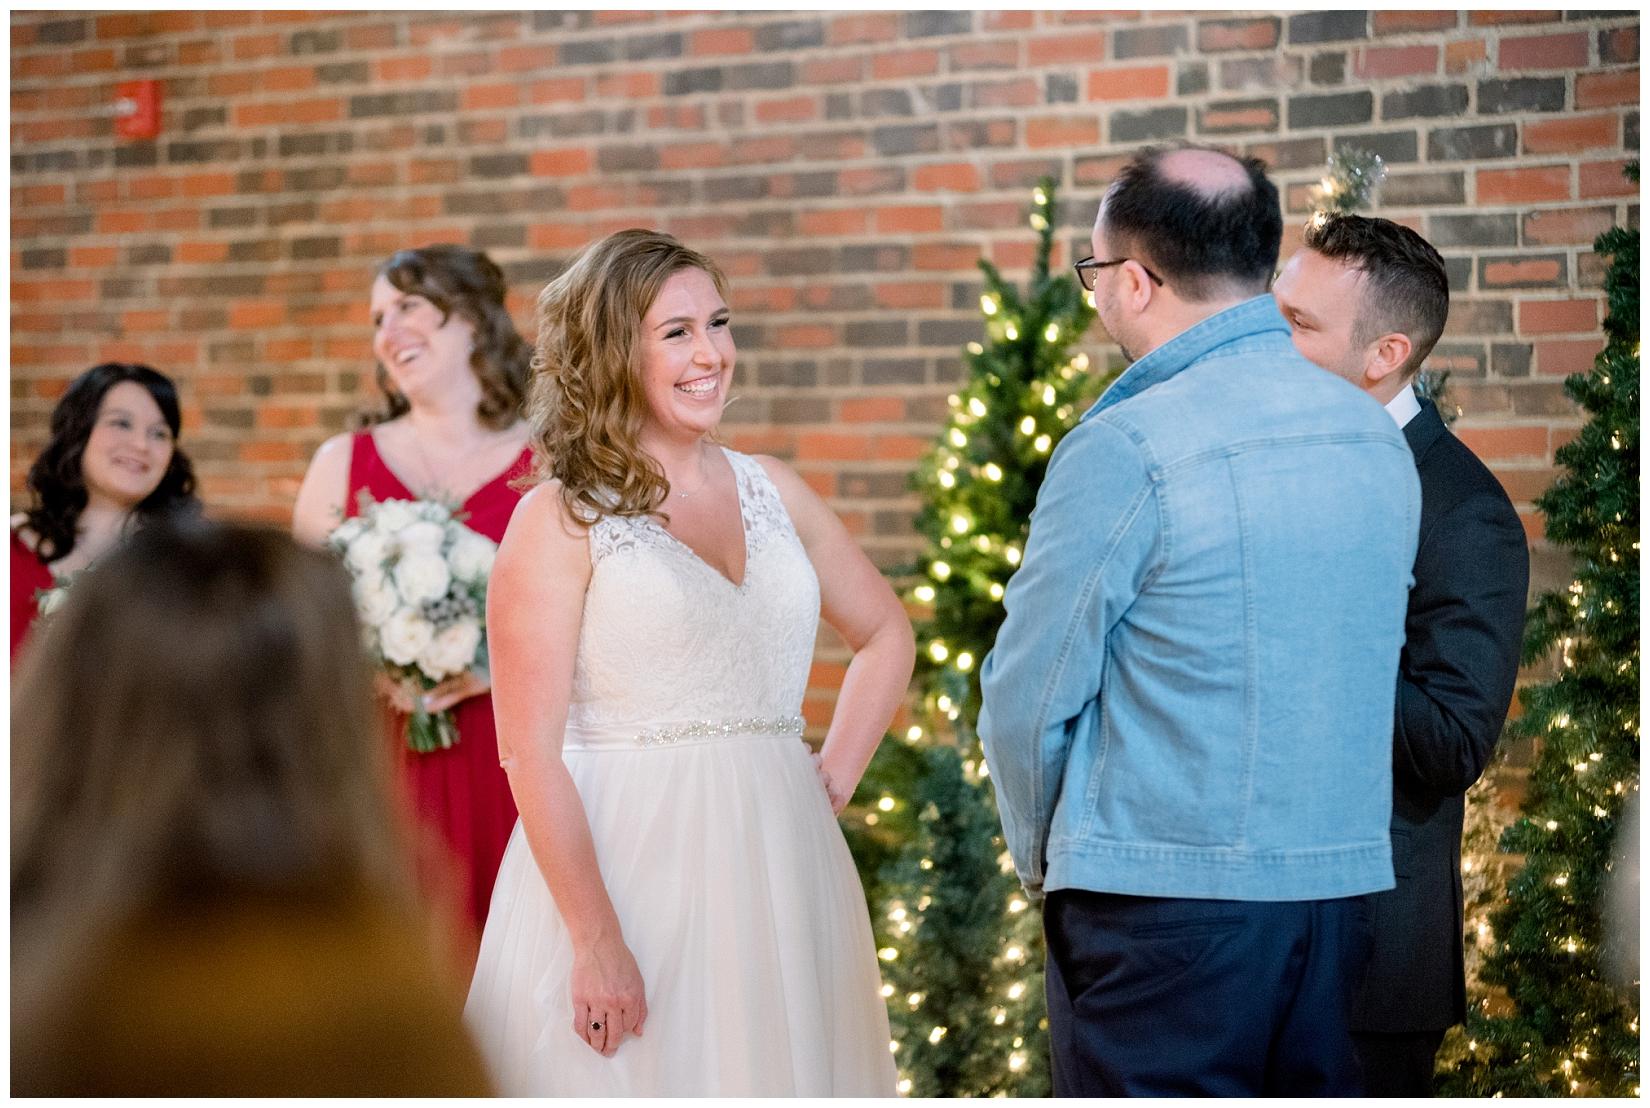 cat-alkire-wedding-photographer-indiana-chicago-indianapolis-fort-wayne_0950.jpg